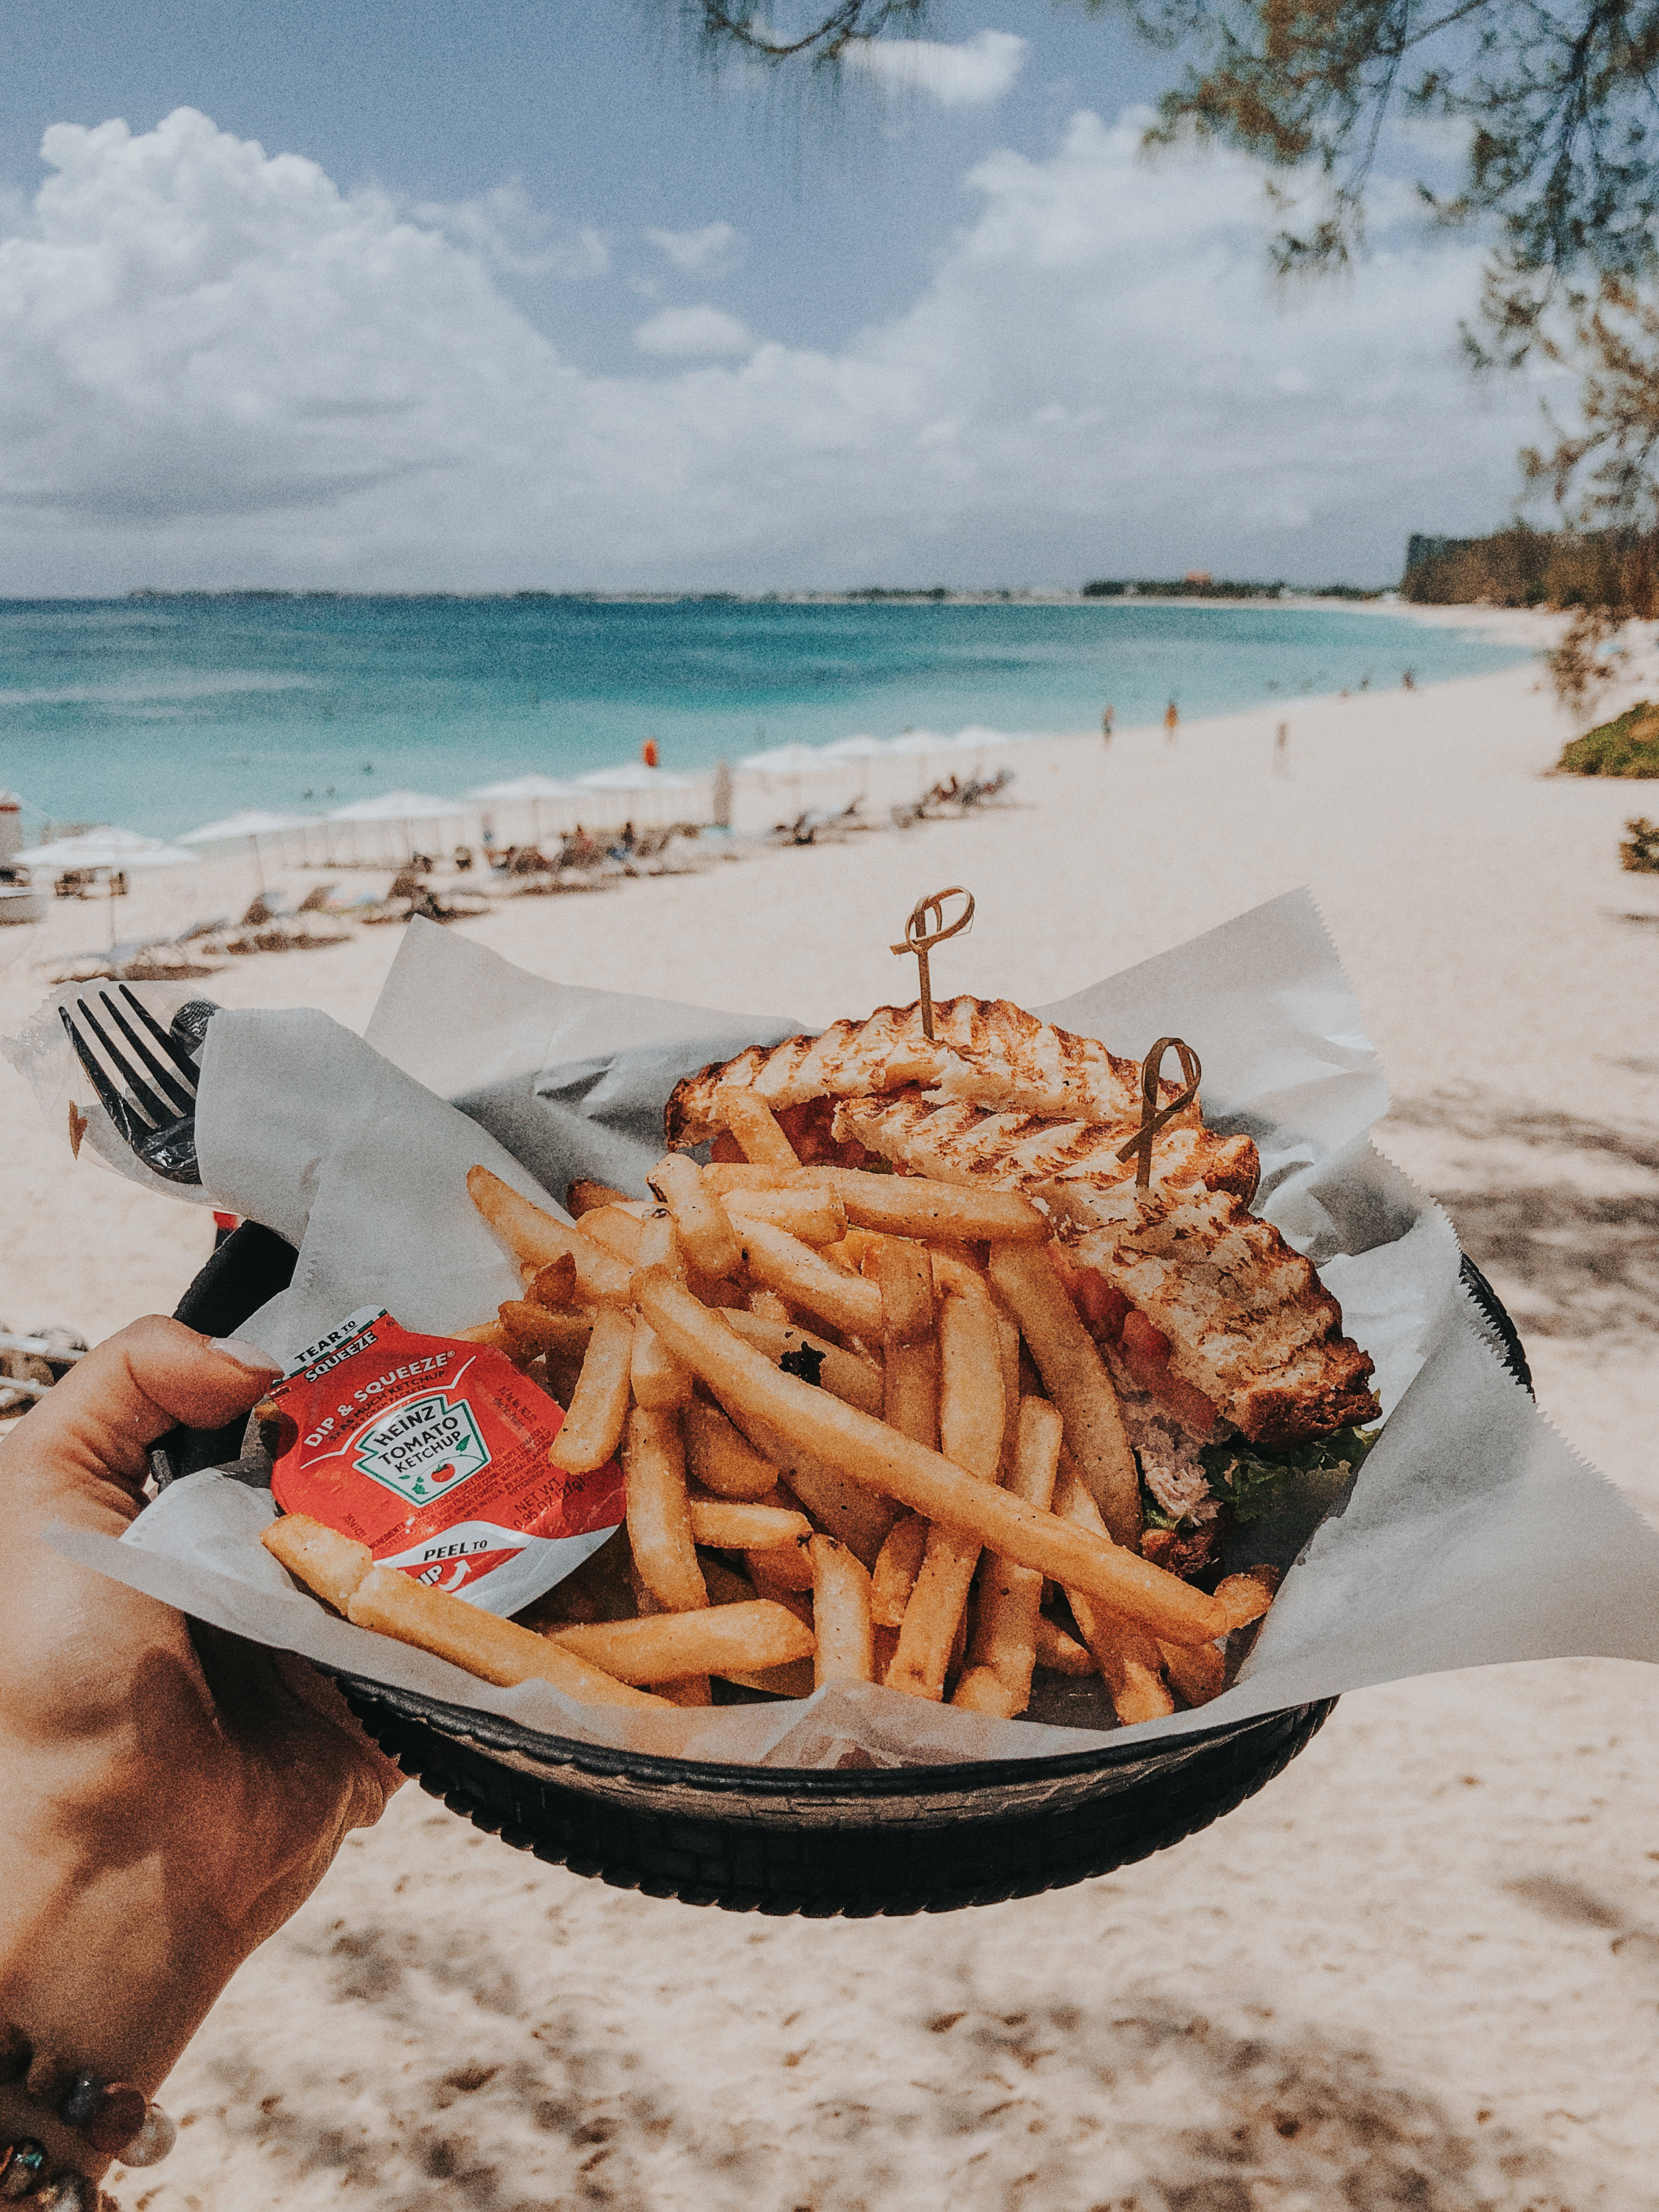 Gluten-free tuna salad sandwich with fries post-water fun